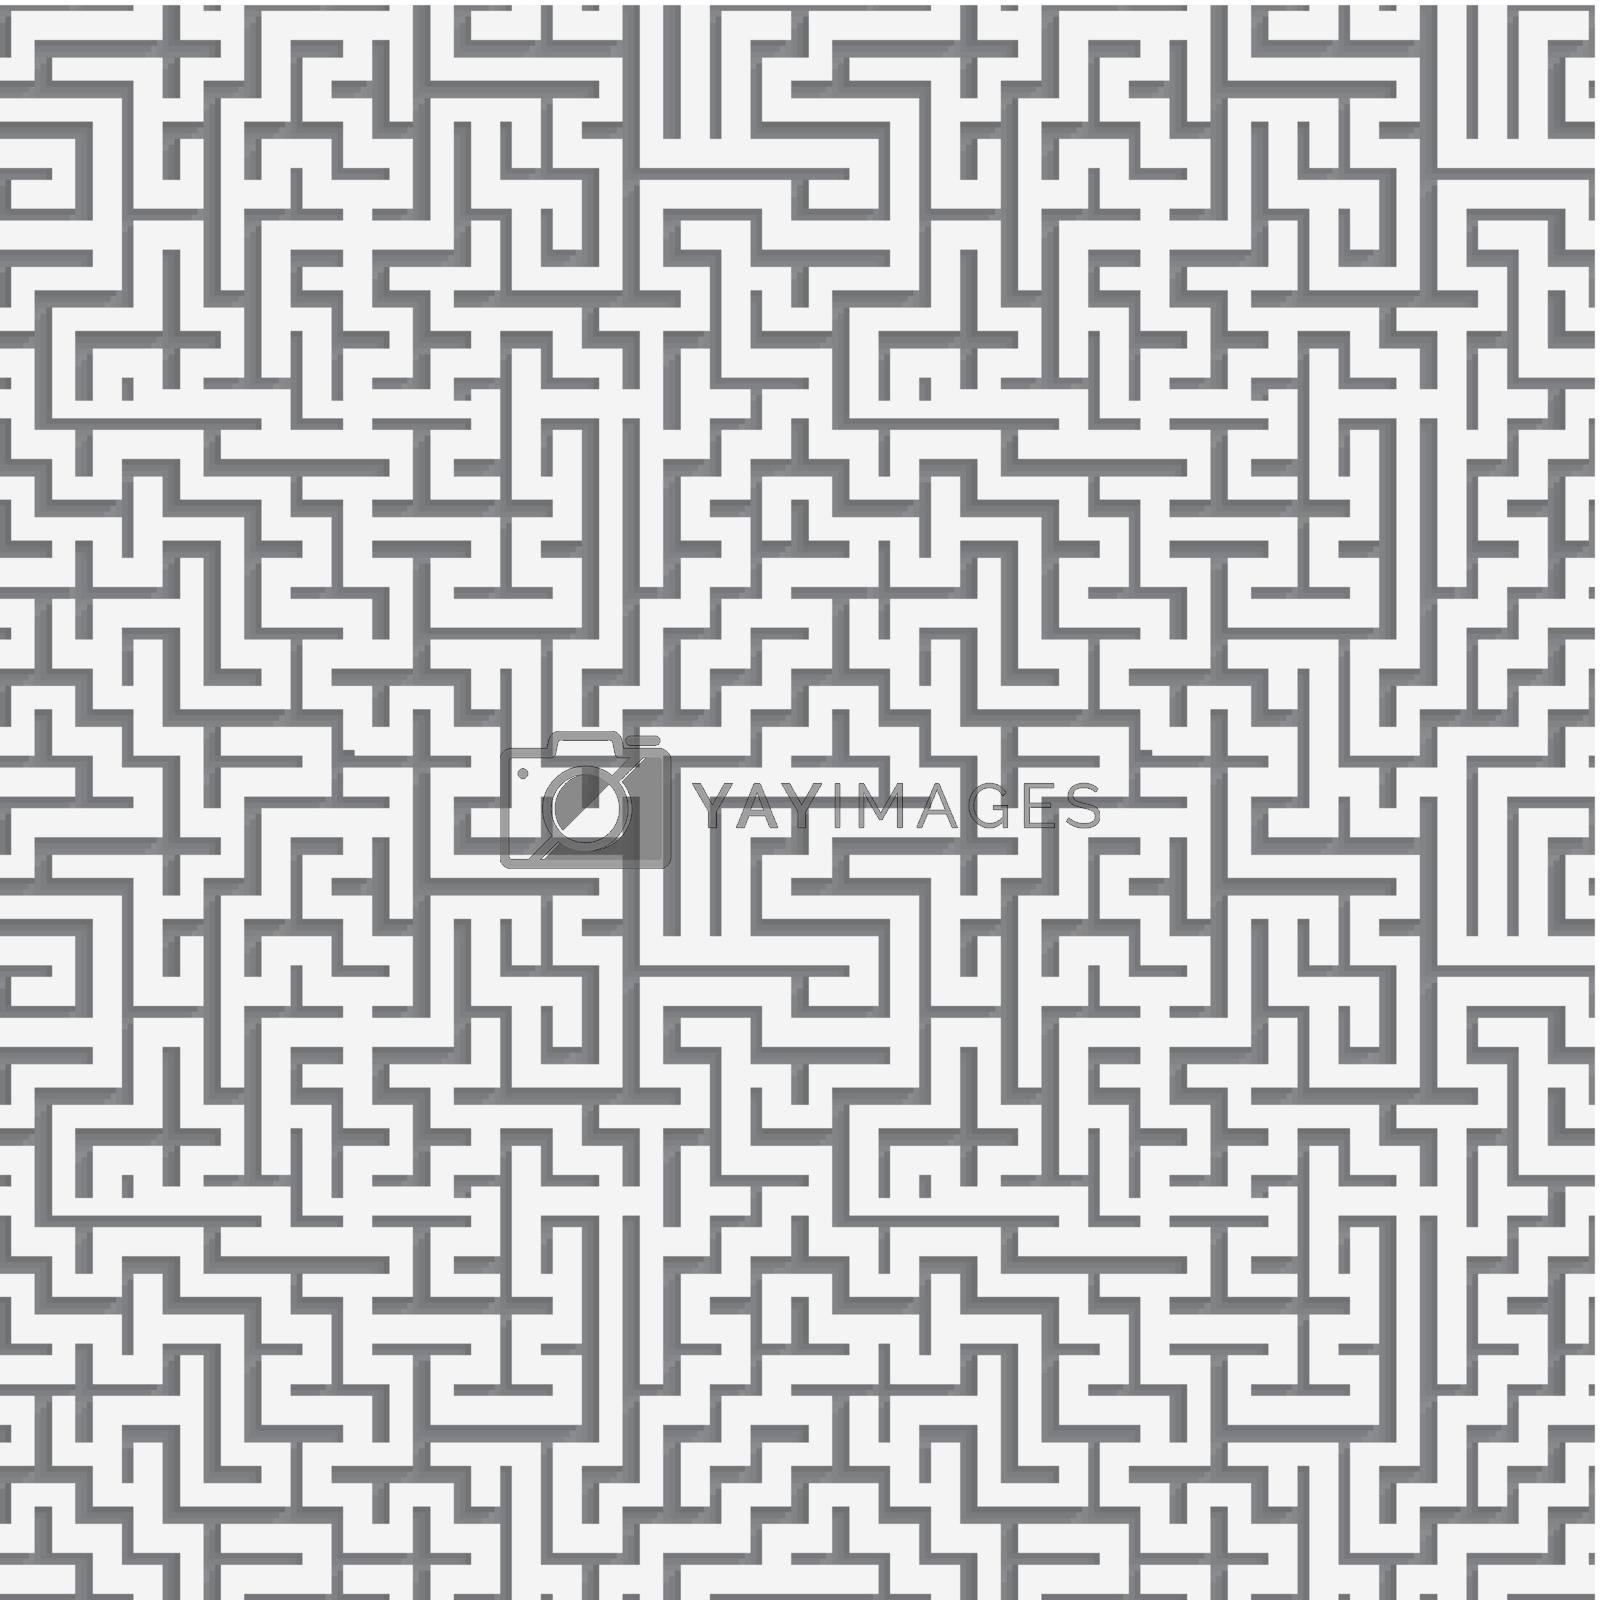 Maze ornament paper cut out seamless by Zebra-Finch